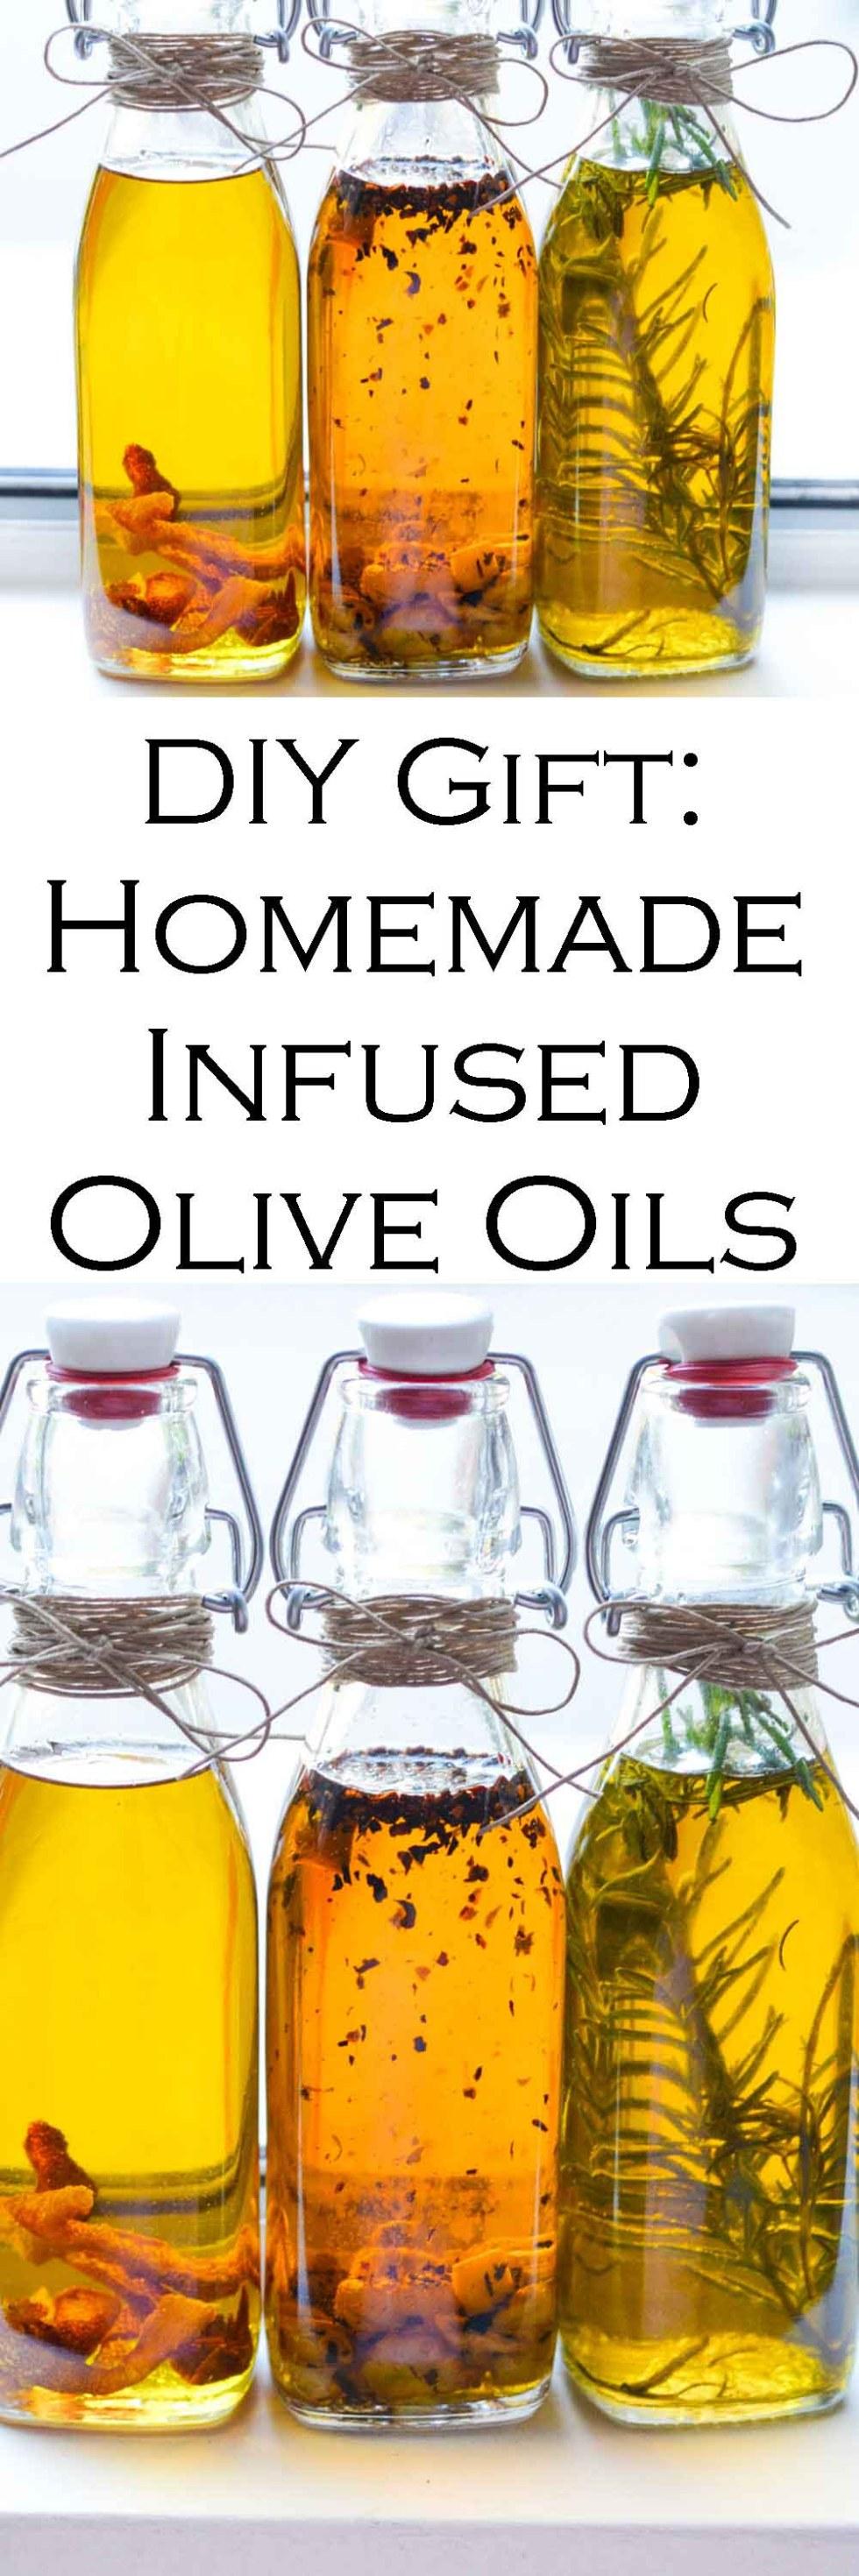 Homemade Gift Idea - Infused Olive Oils #christmasgifts #homemadegifts #diygifts #homemaking #oliveoil #healthyrecipes #LMrecipes